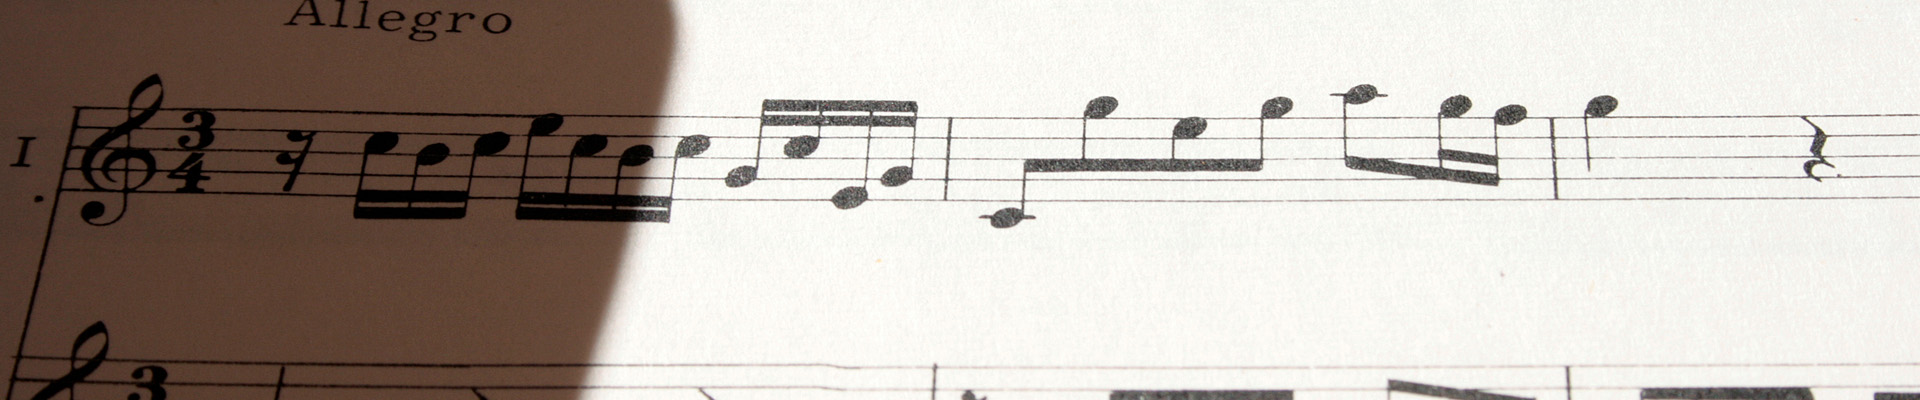 musiknoten-stephan-pieger-muenchen-oboe-2018